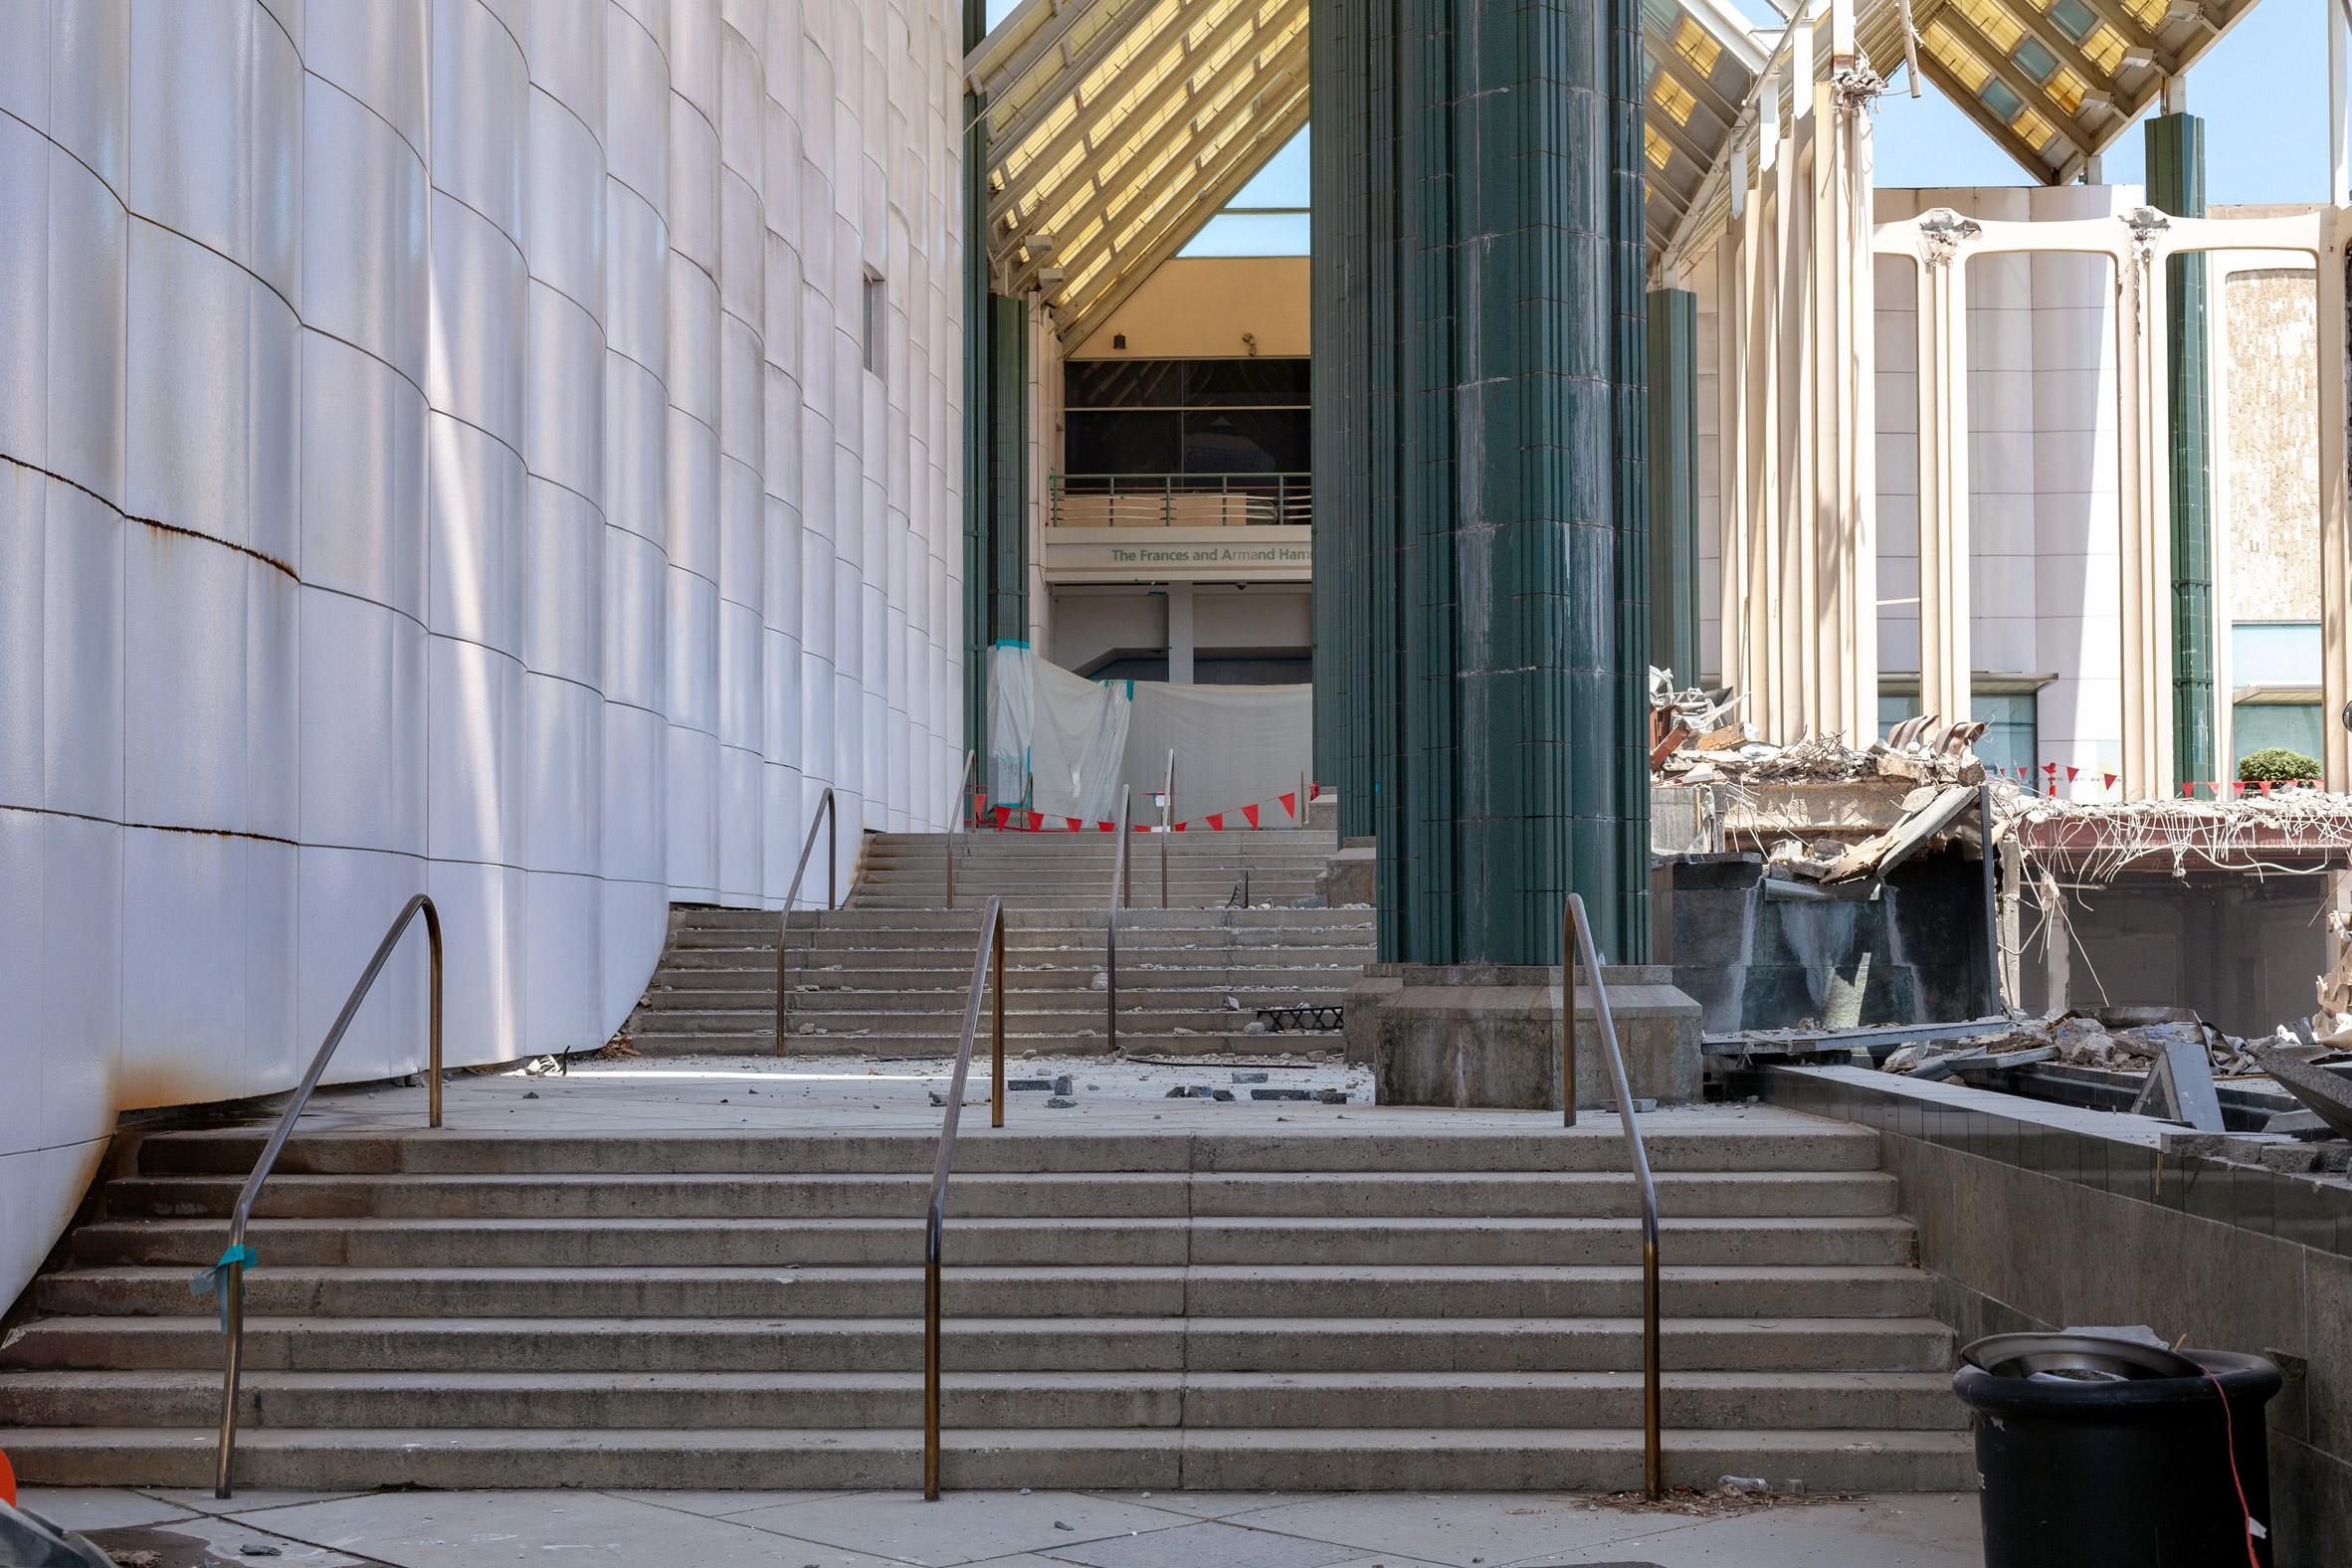 Photography reveals demolition of LACMA buildings during coronavirus pandemic